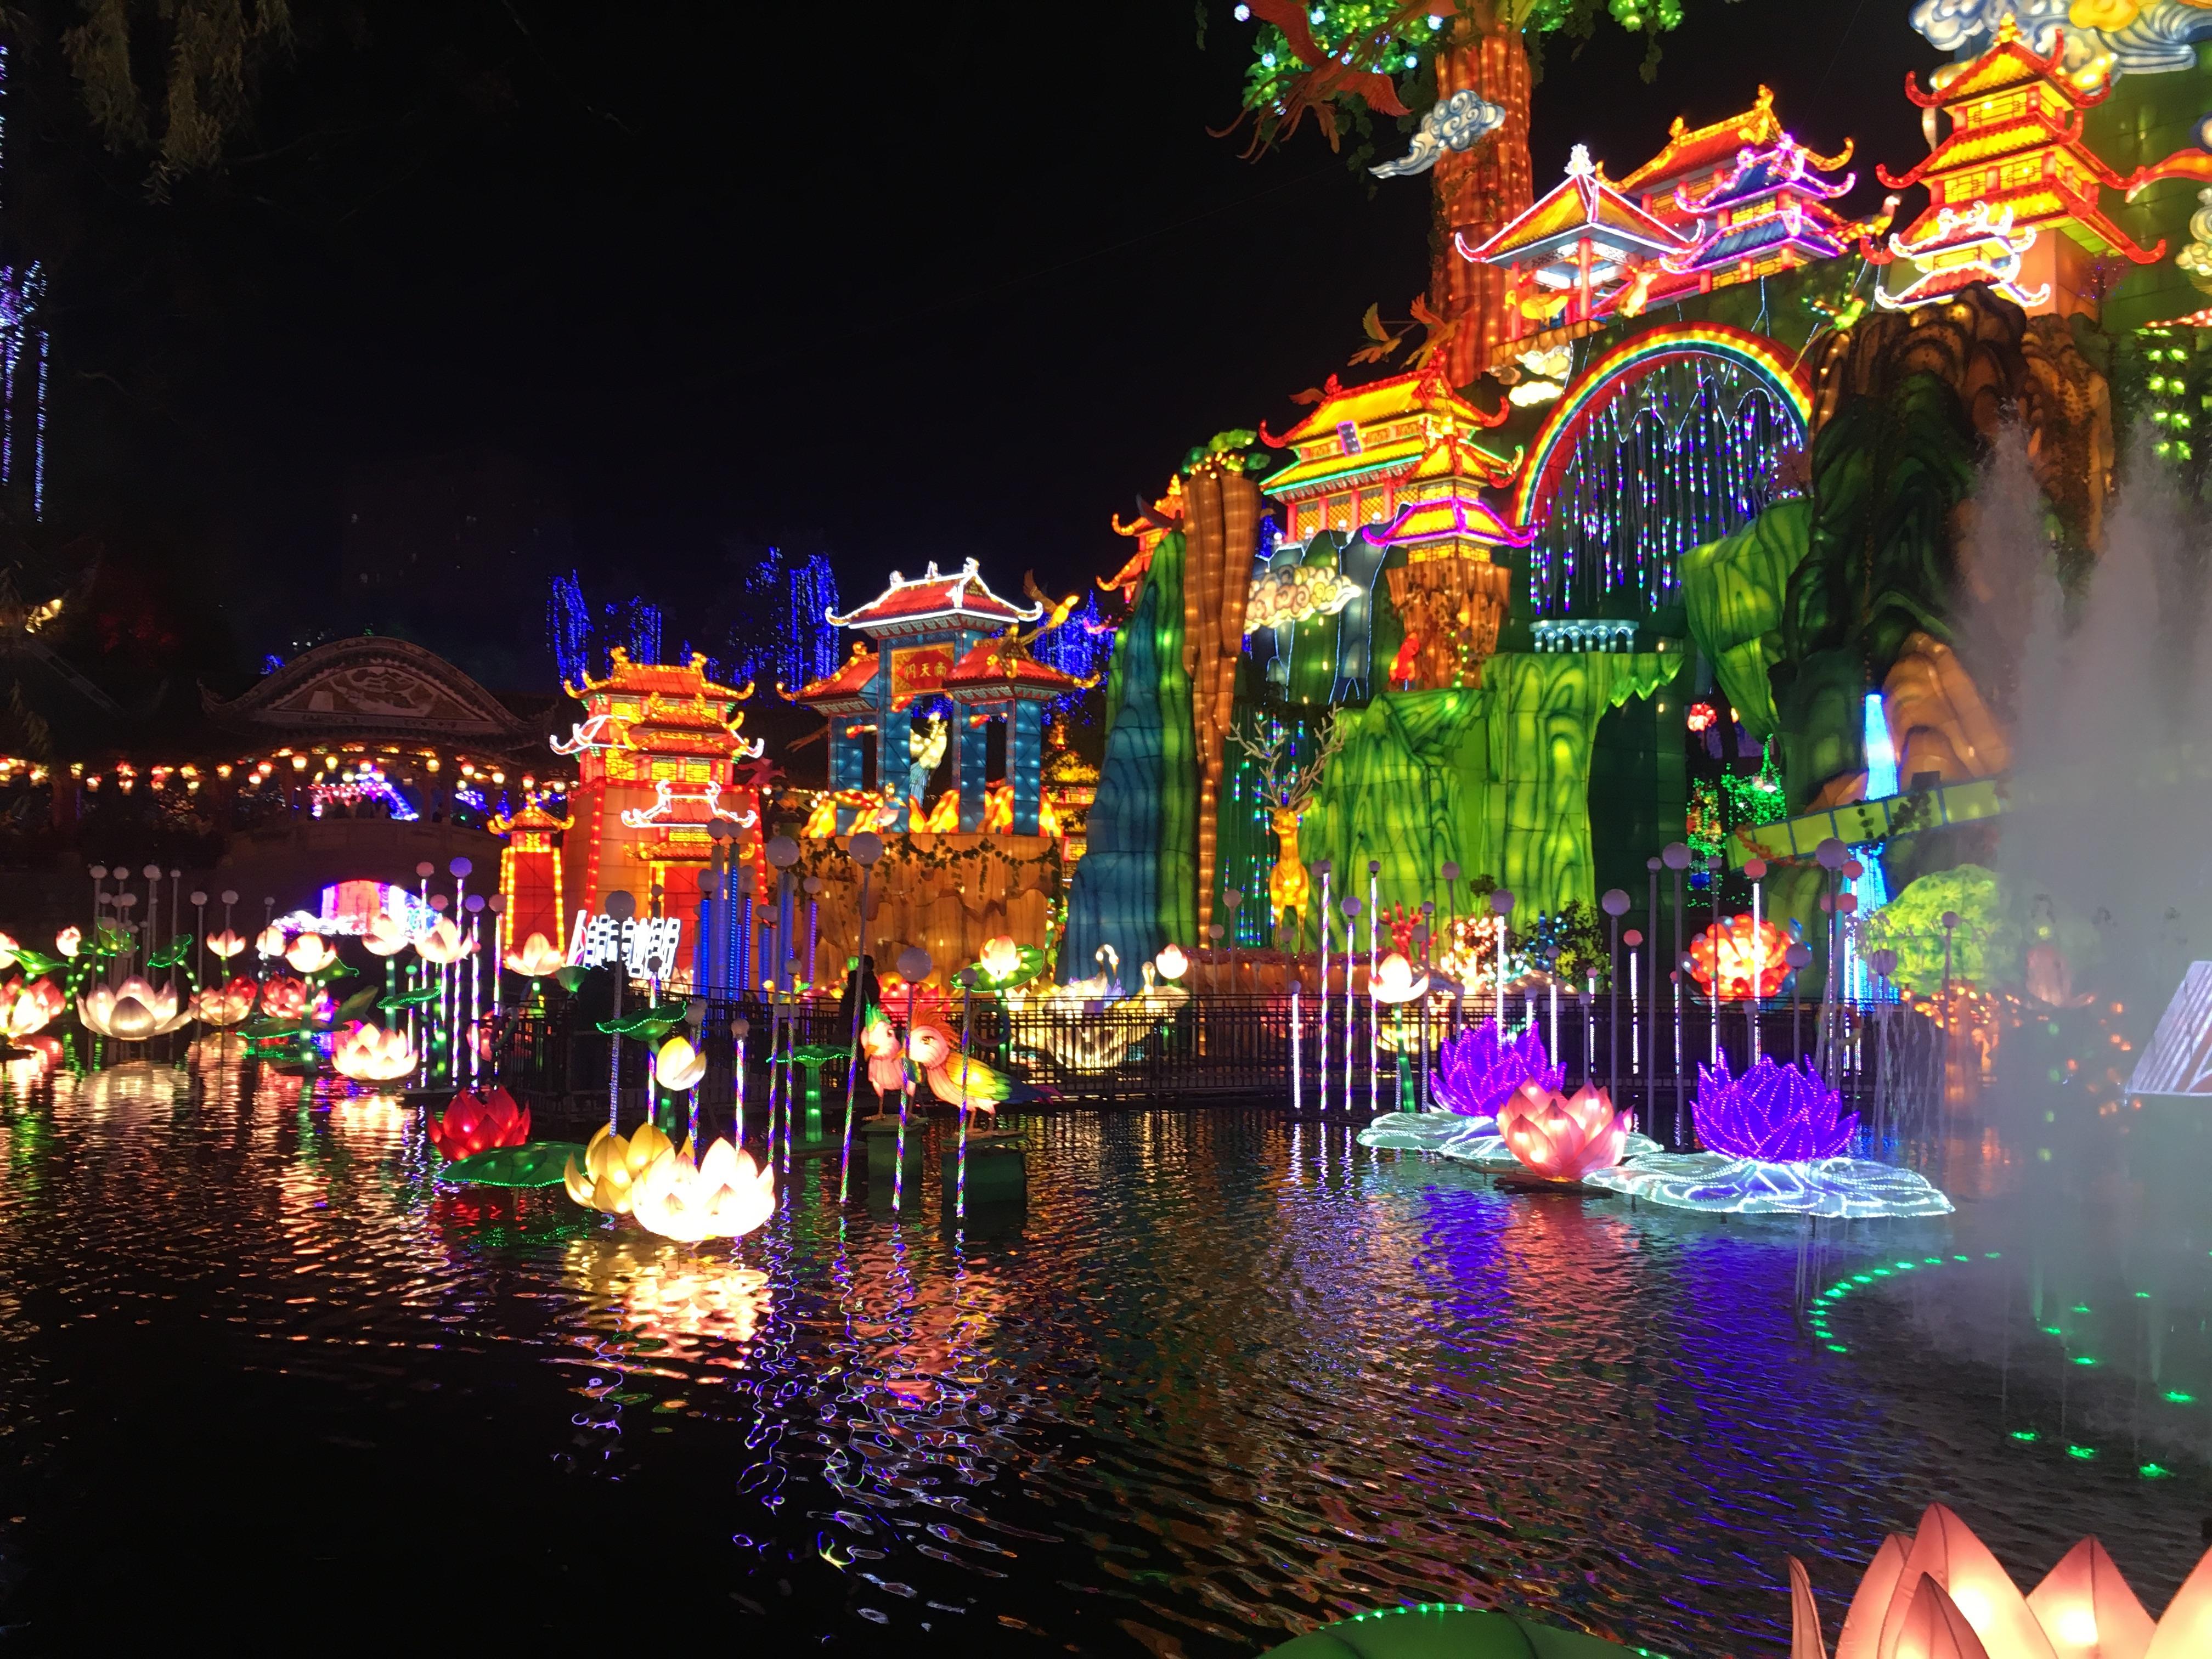 lantern festival zigong china international twenty manufacturer third chinese lanterns water parade cartoon luminous dragon company landscape lighting animal landscapes